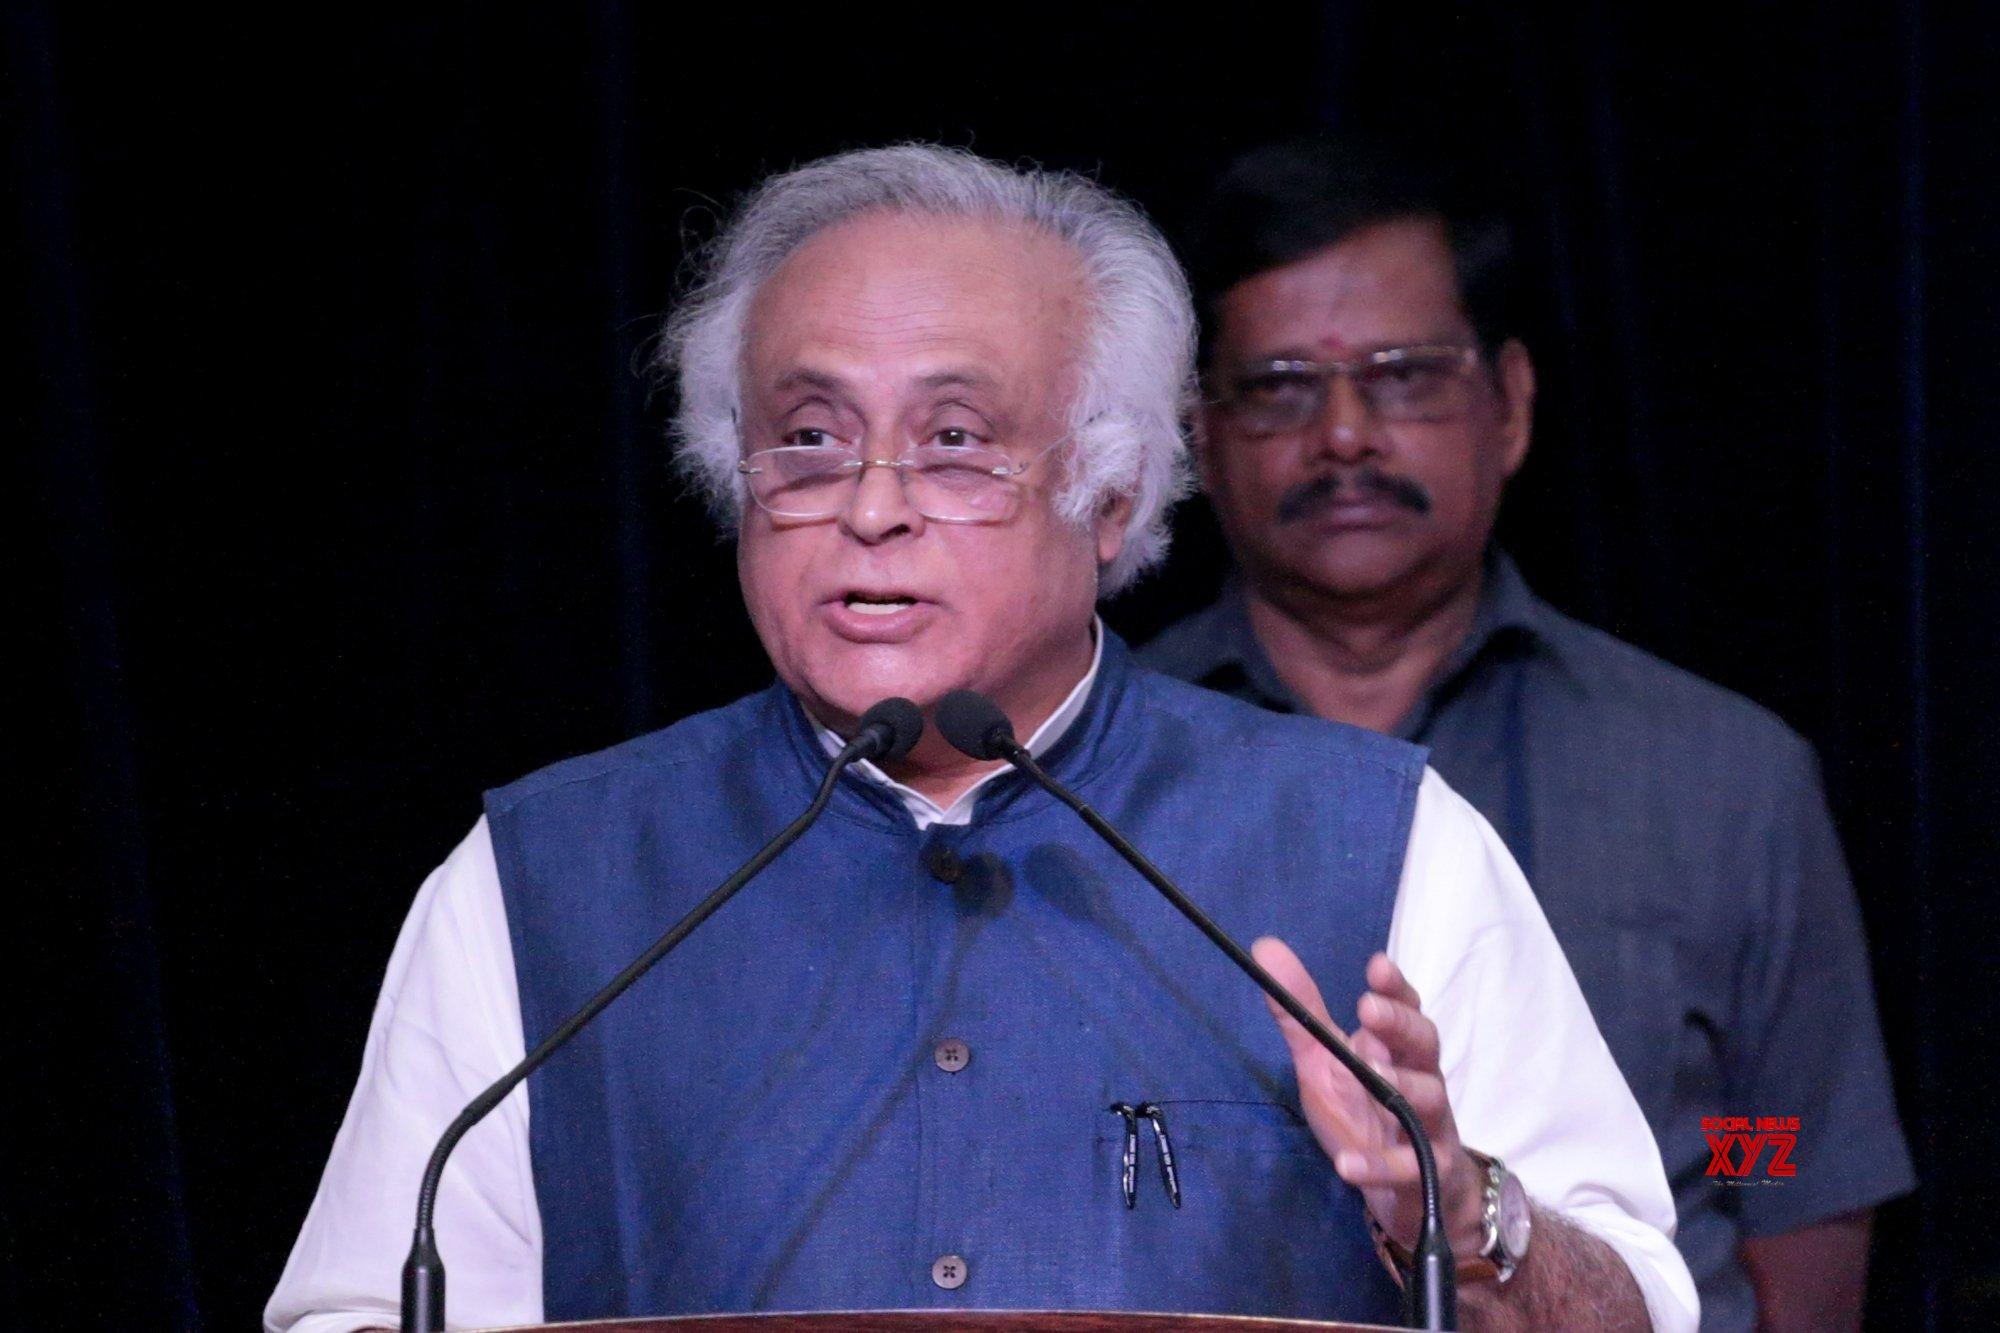 After opposing beef, Jairam Ramesh finds ally in VHP